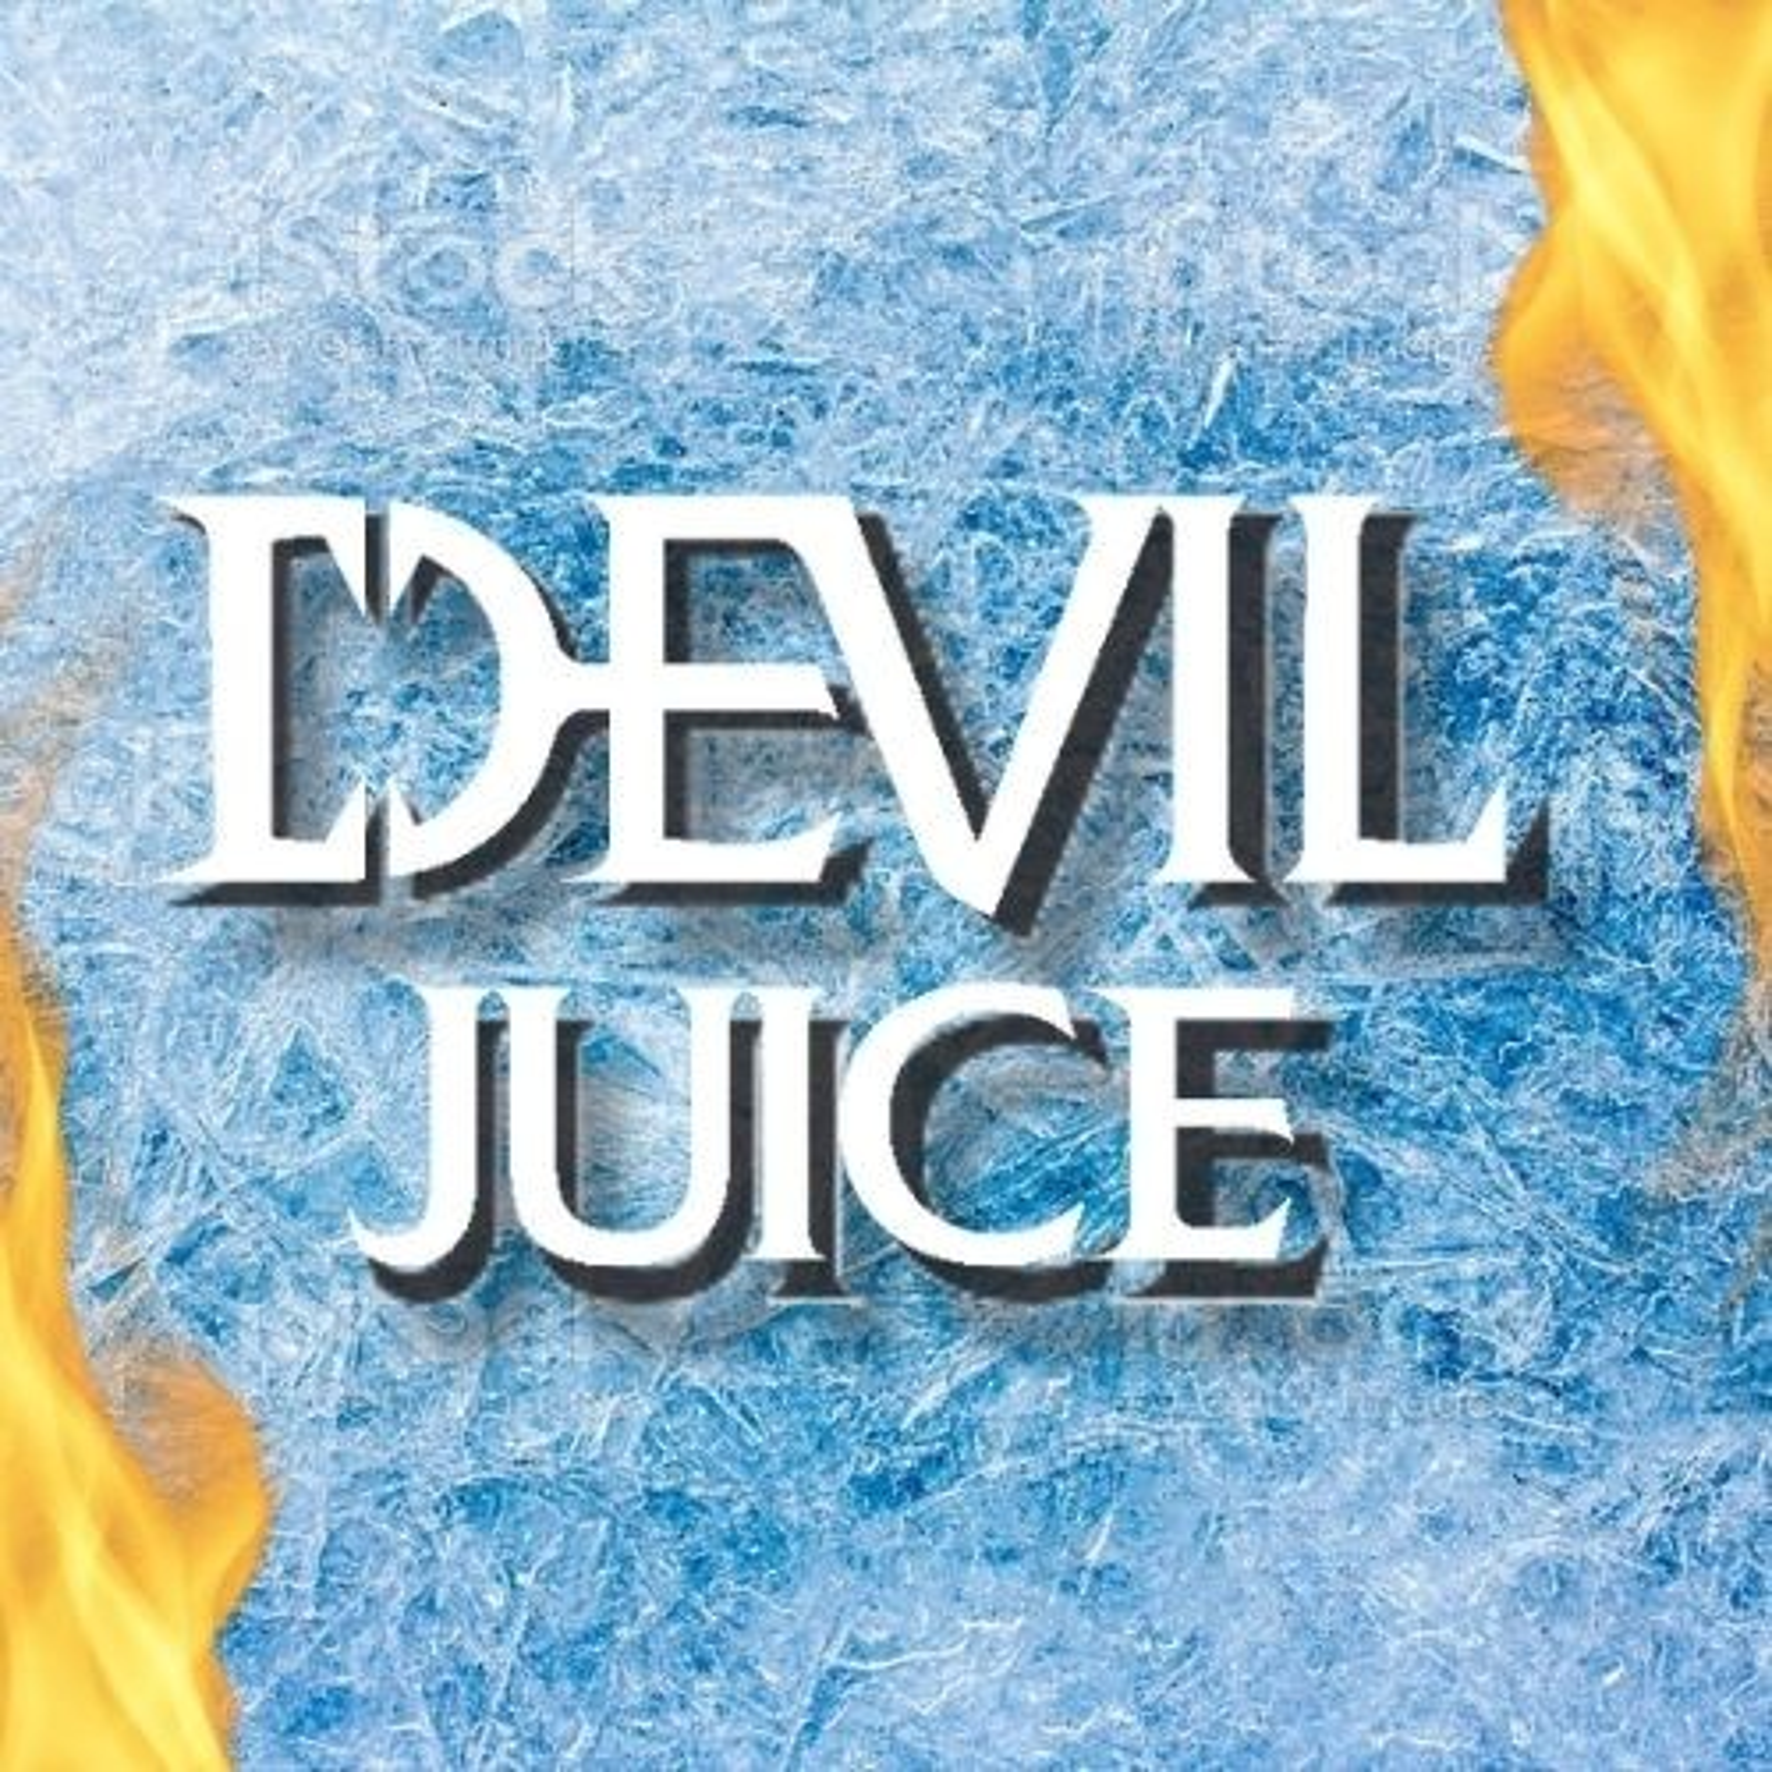 DEVIL JUICE